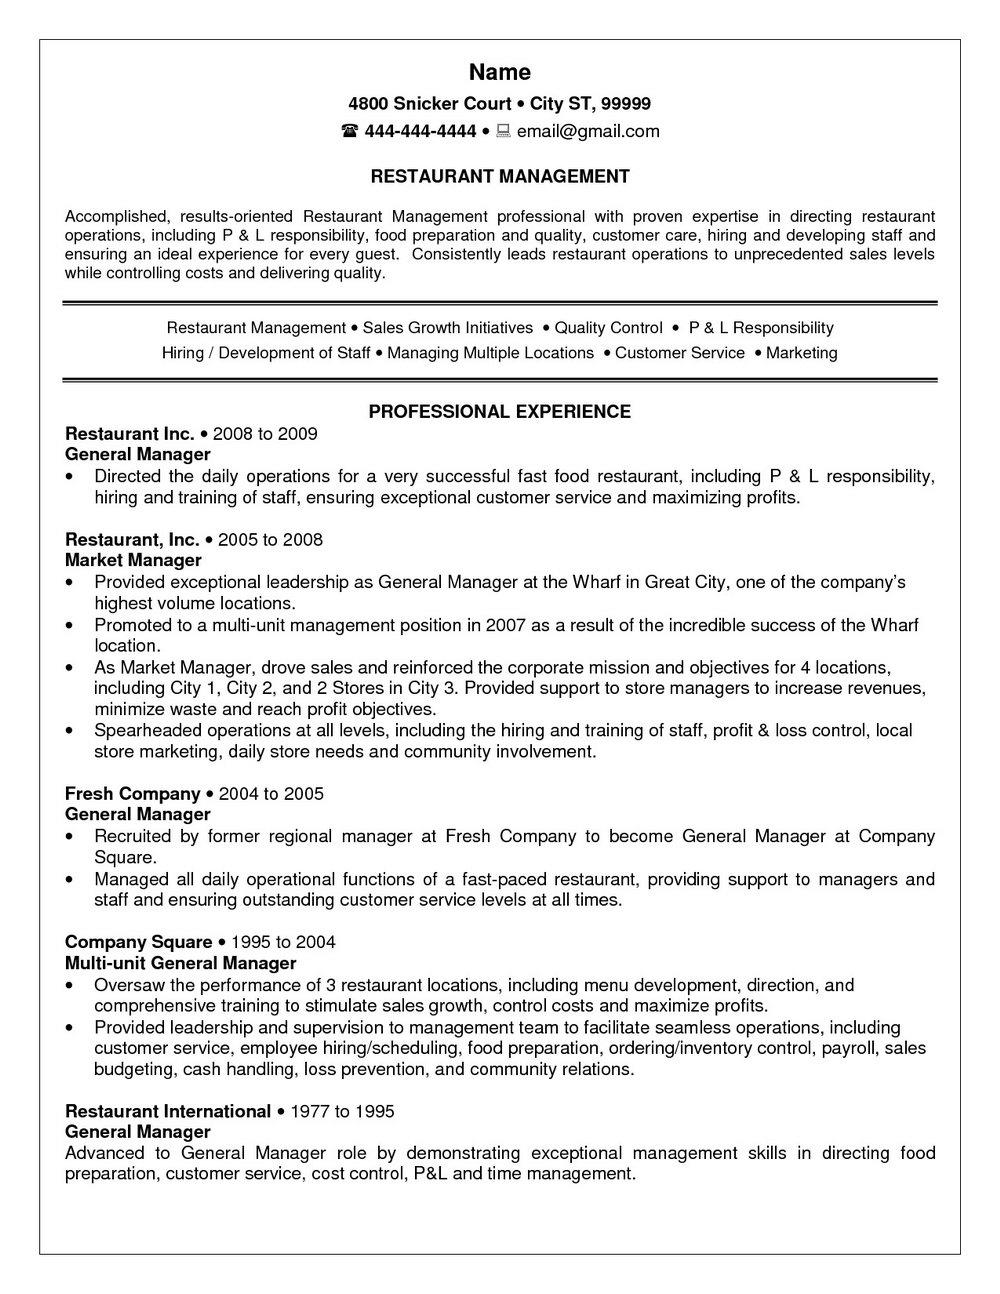 Resume Templates For Restaurant Jobs Templates 22613